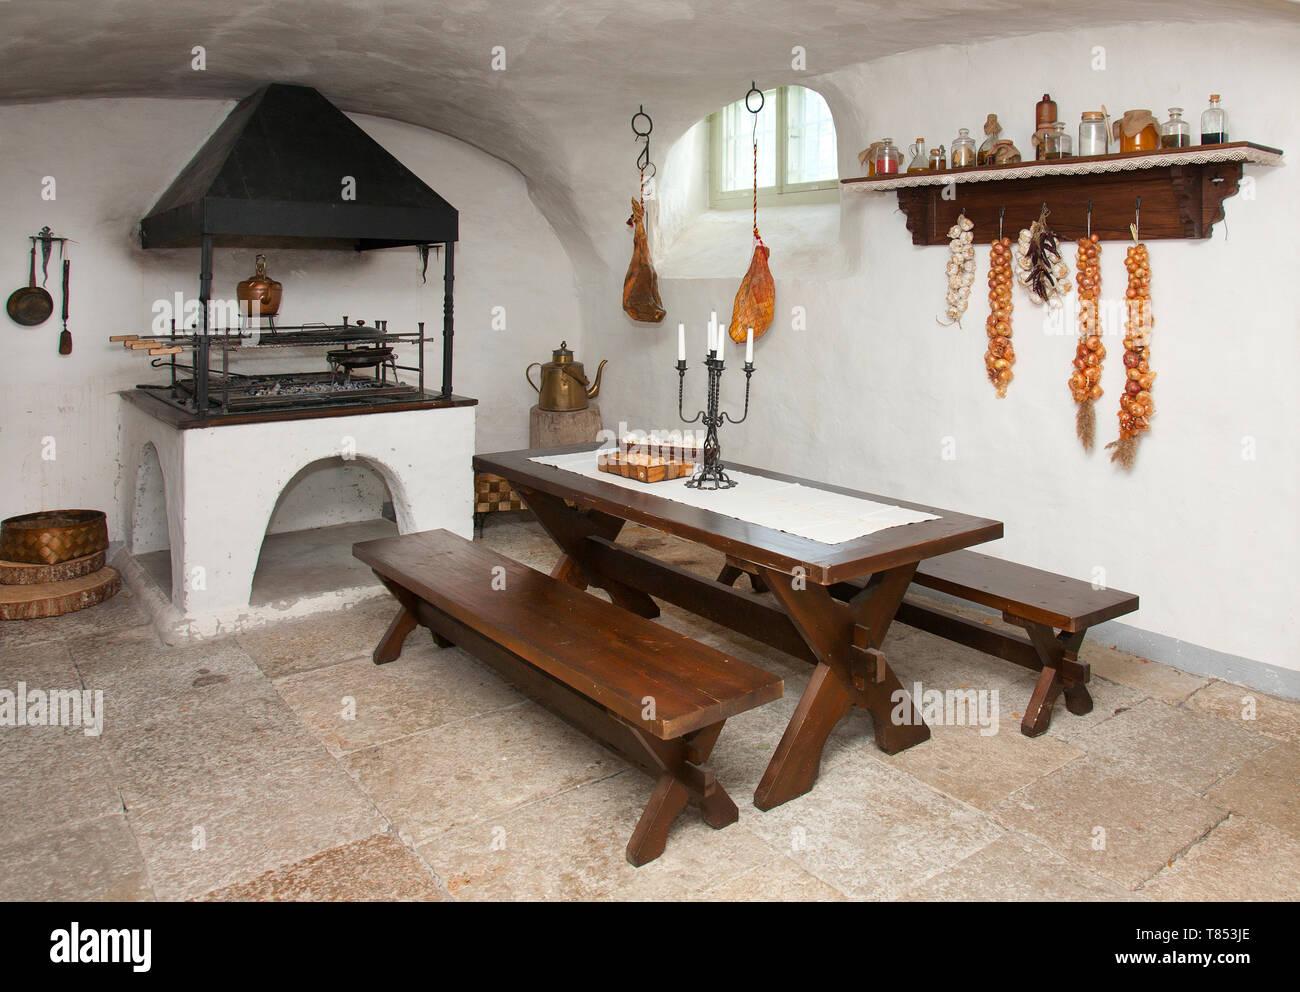 Basement Kitchen - Stock Image